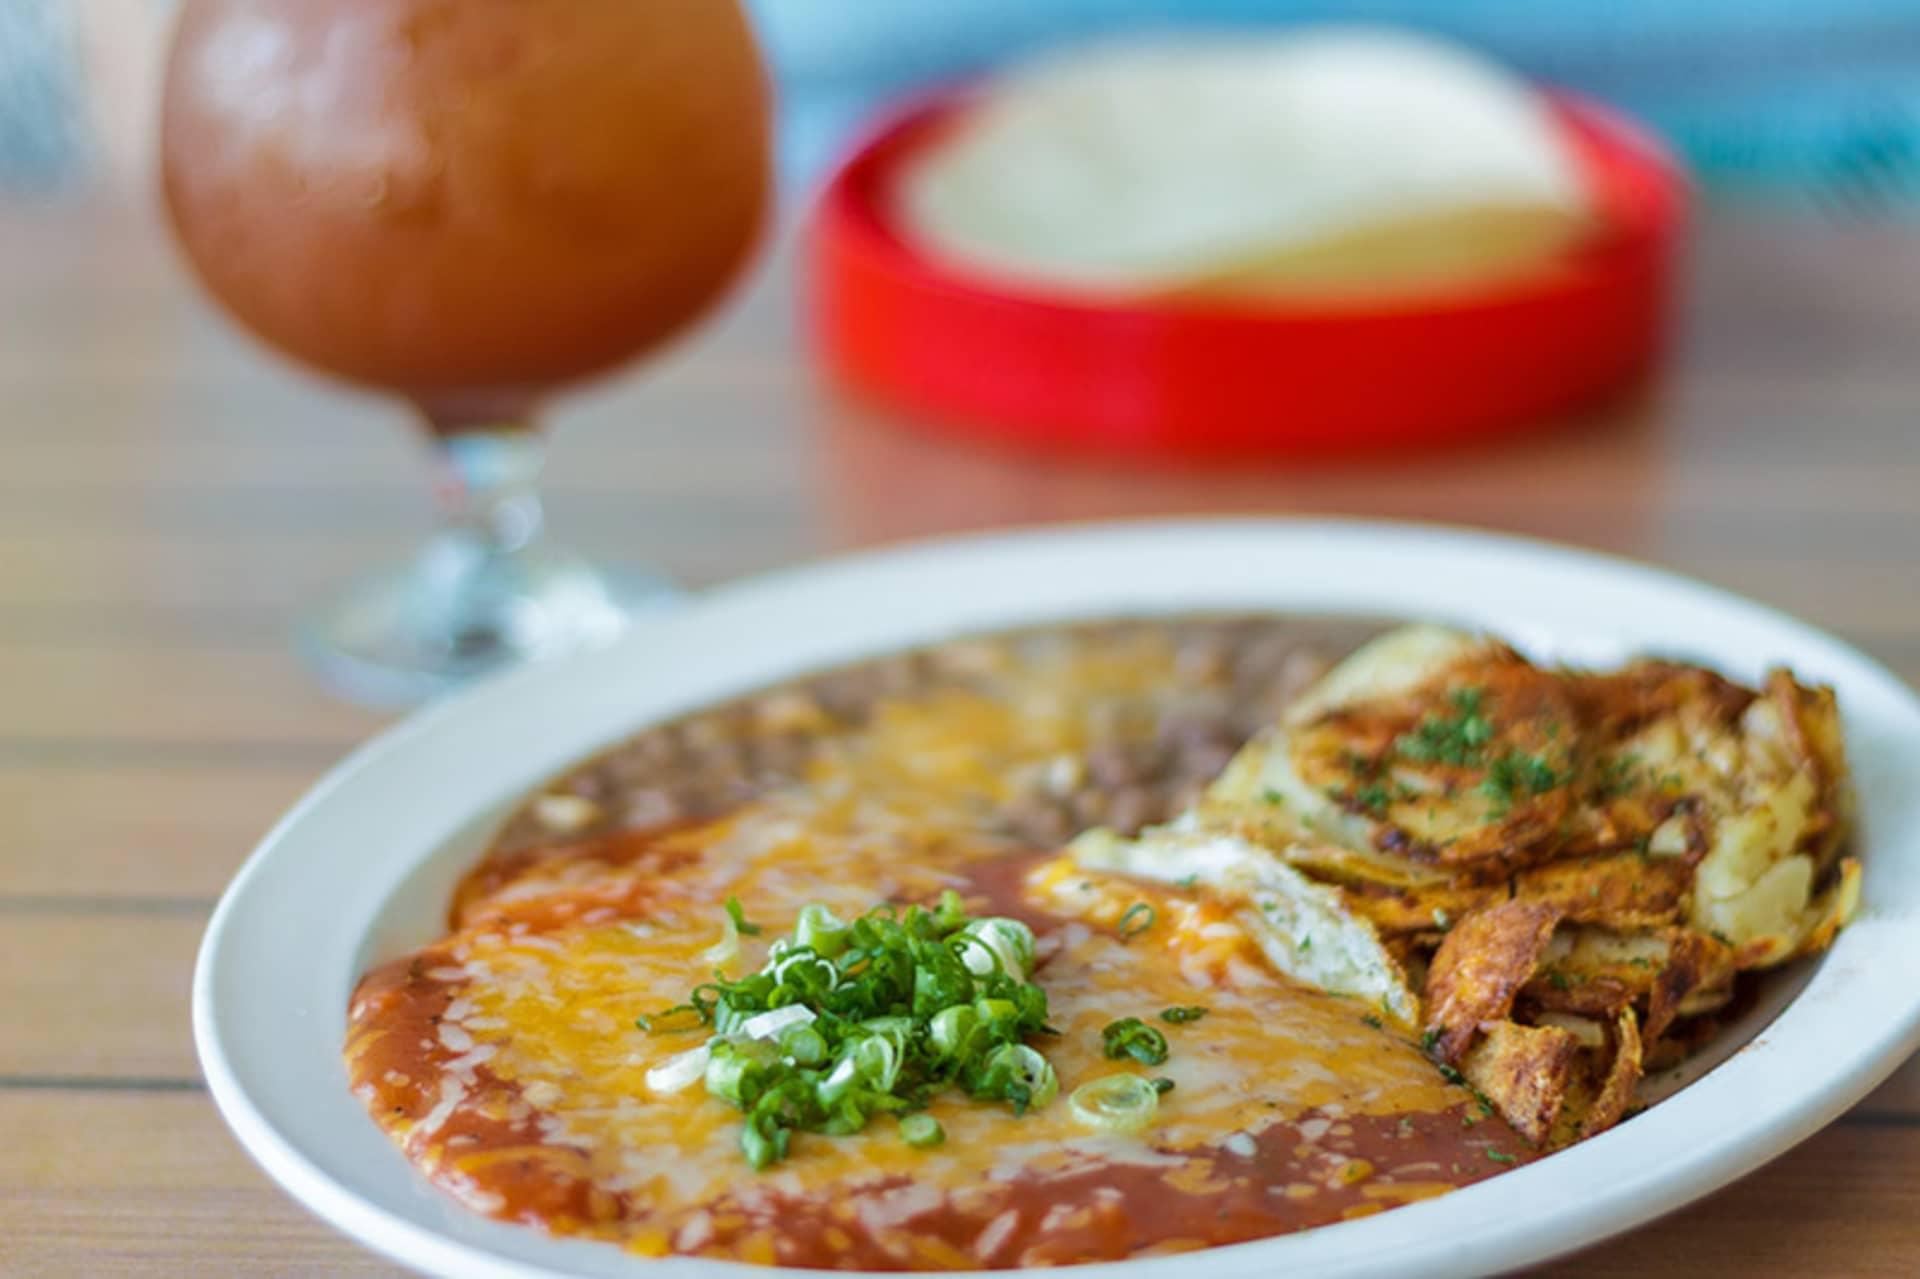 A taste of Baja in Laguna Beach